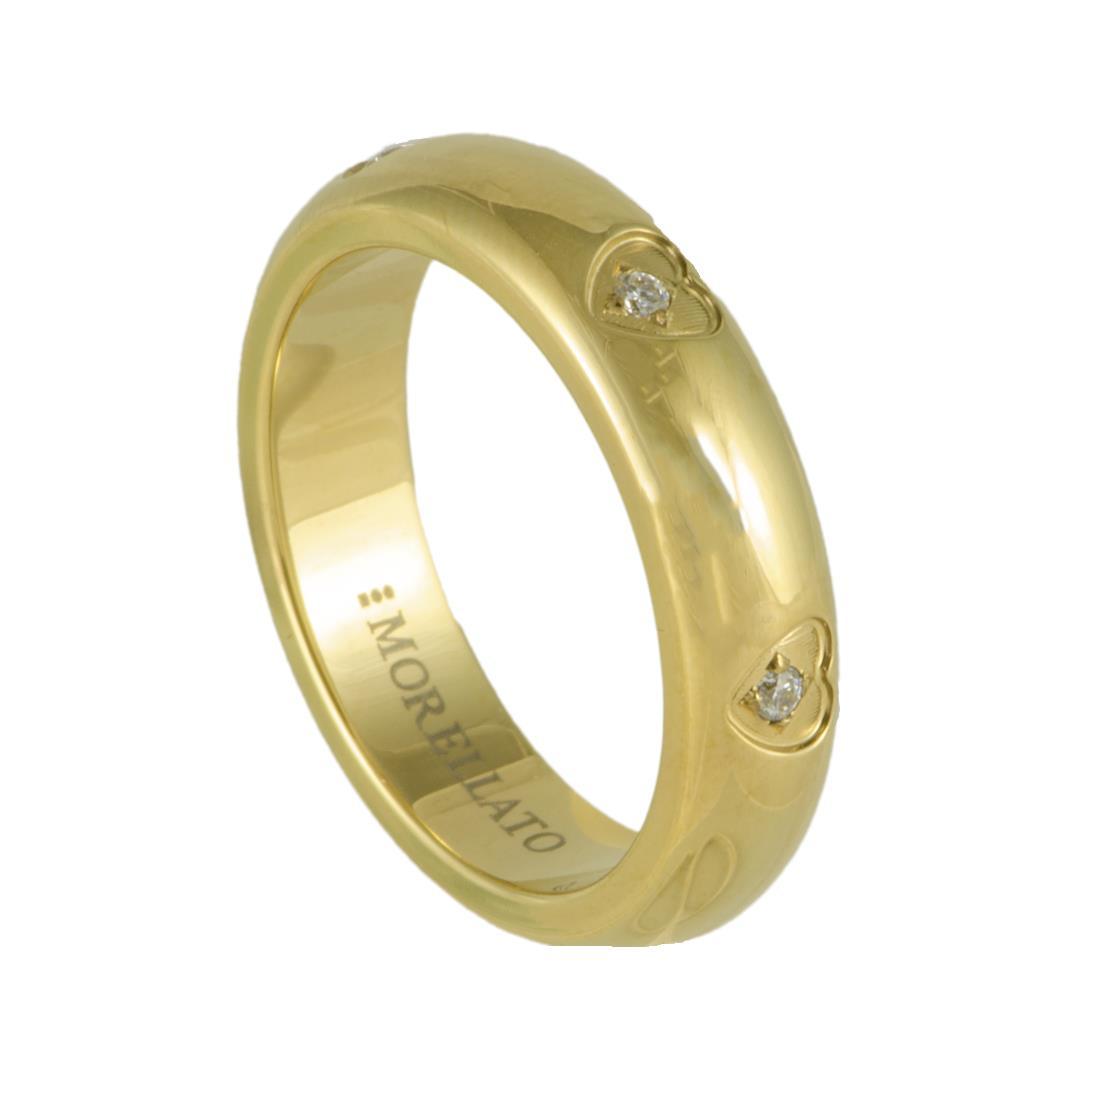 LOVE RINGS AN.CUORE GOLD PVD MIS 16 - MORELLATO